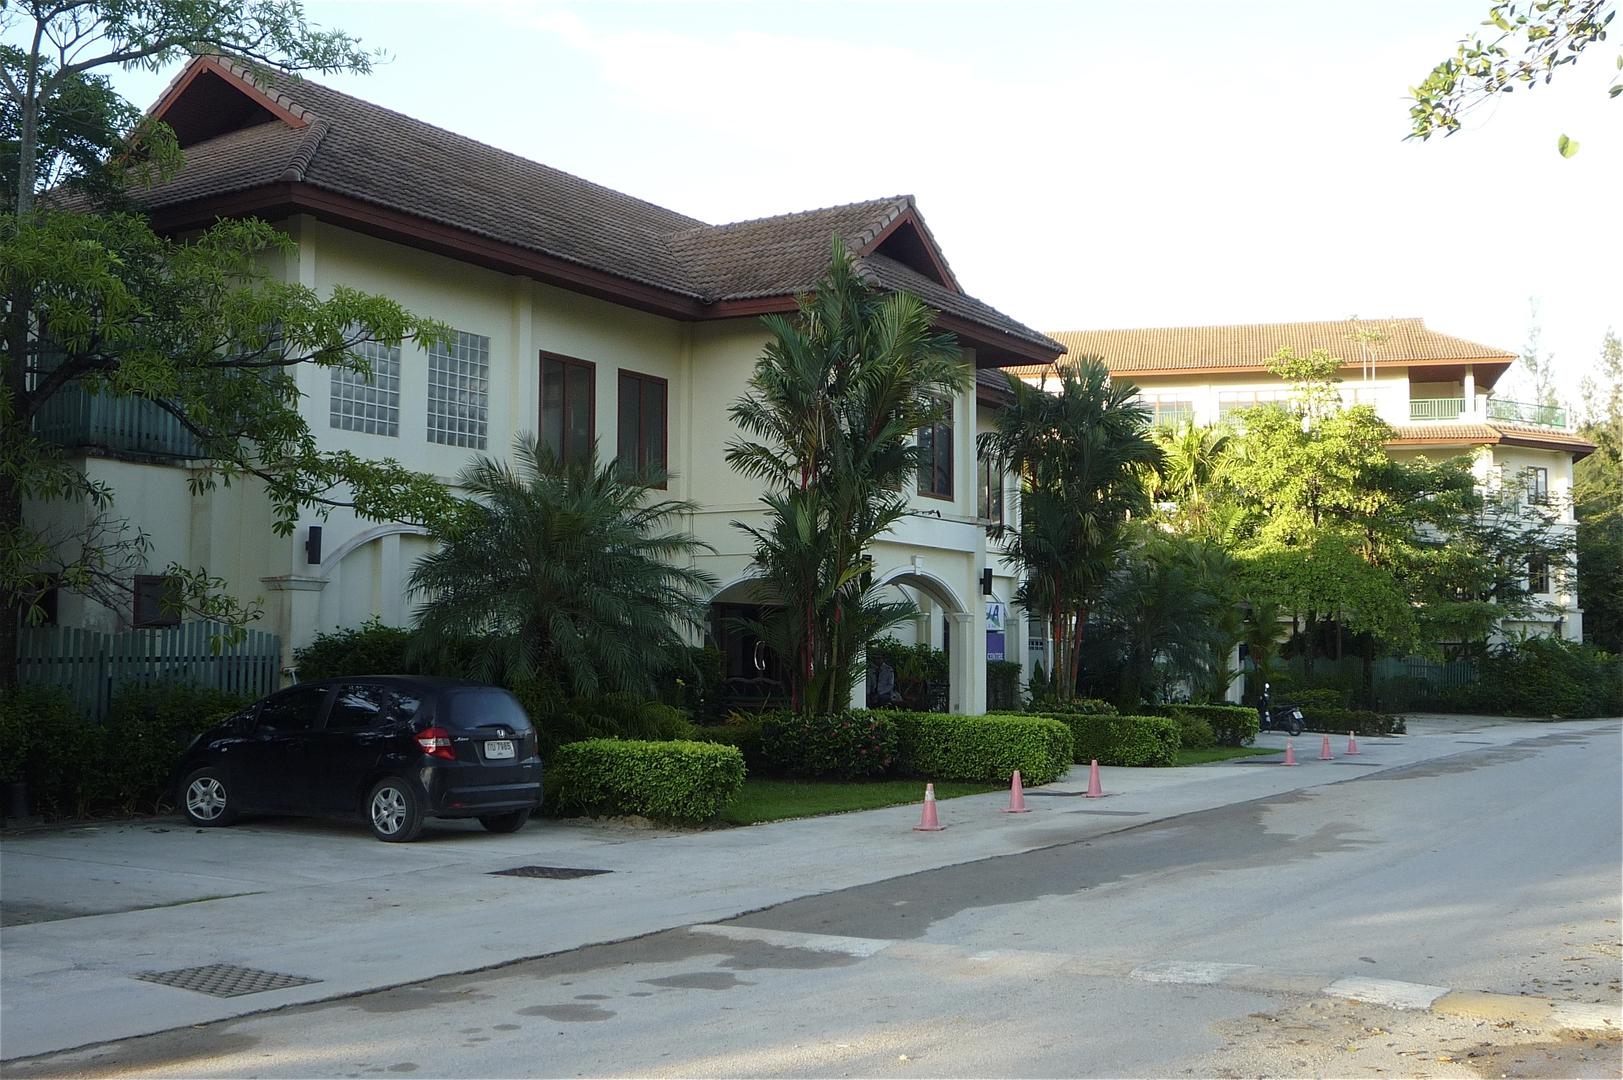 Entrance to estate